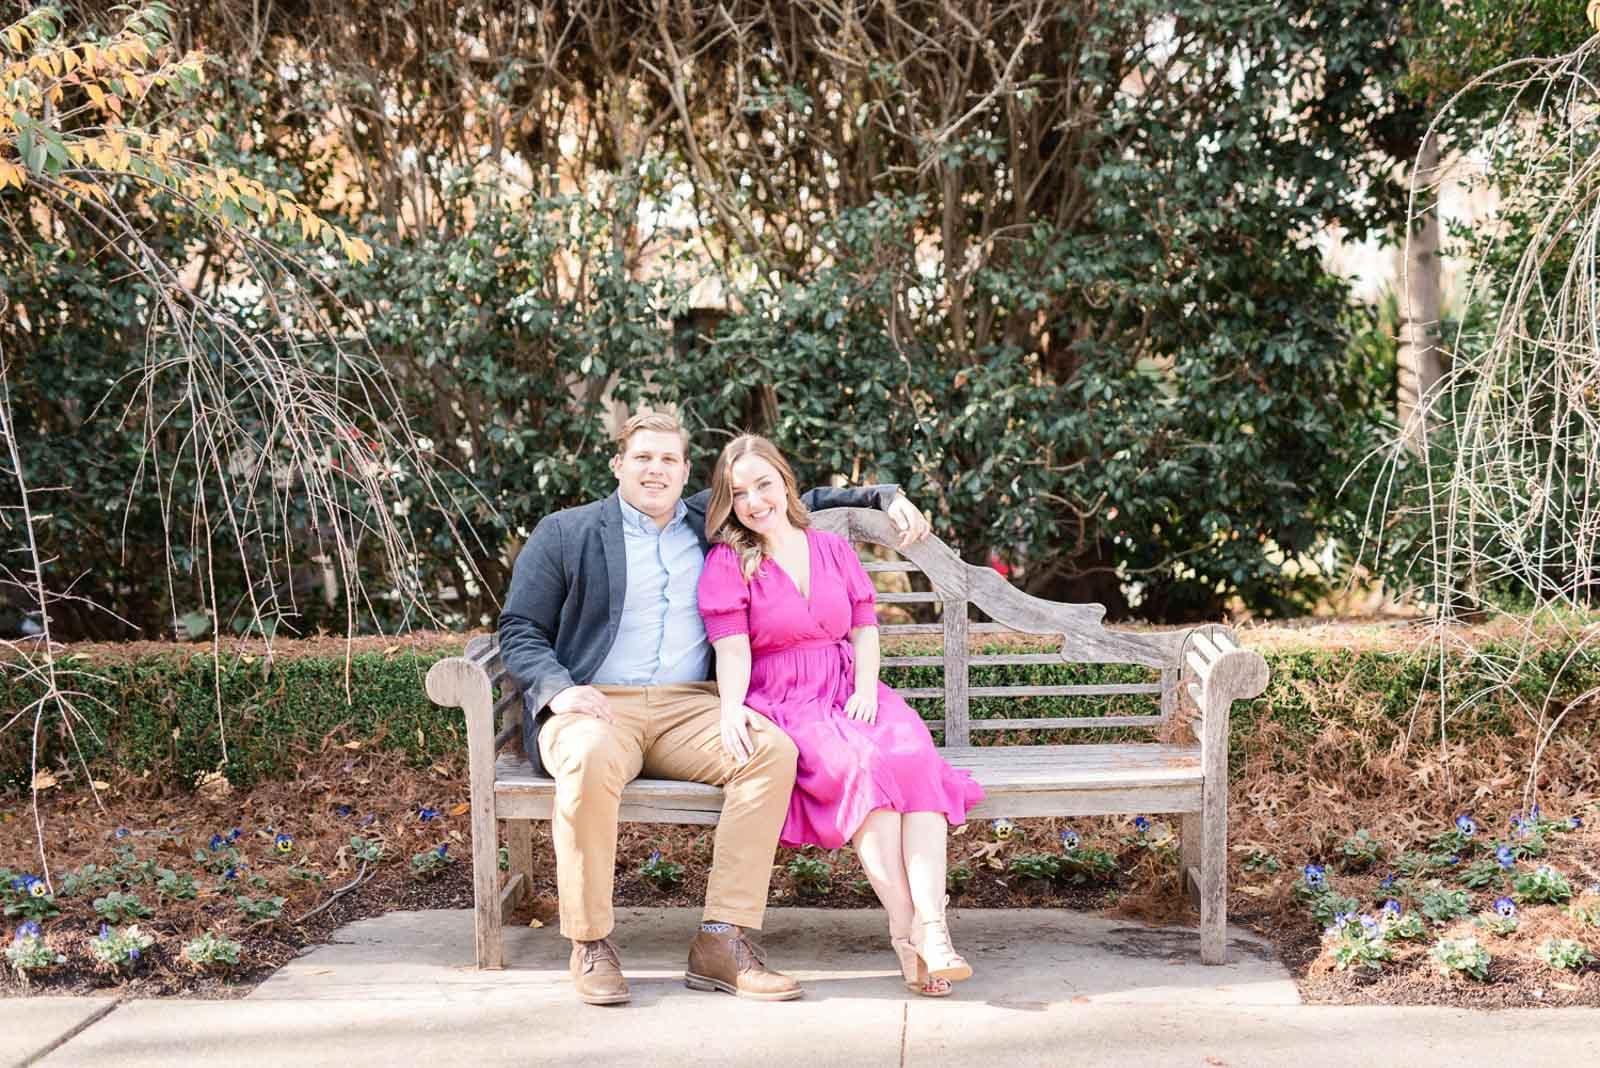 Dallas Arboretum Engagement-JenSymes-10.jpg